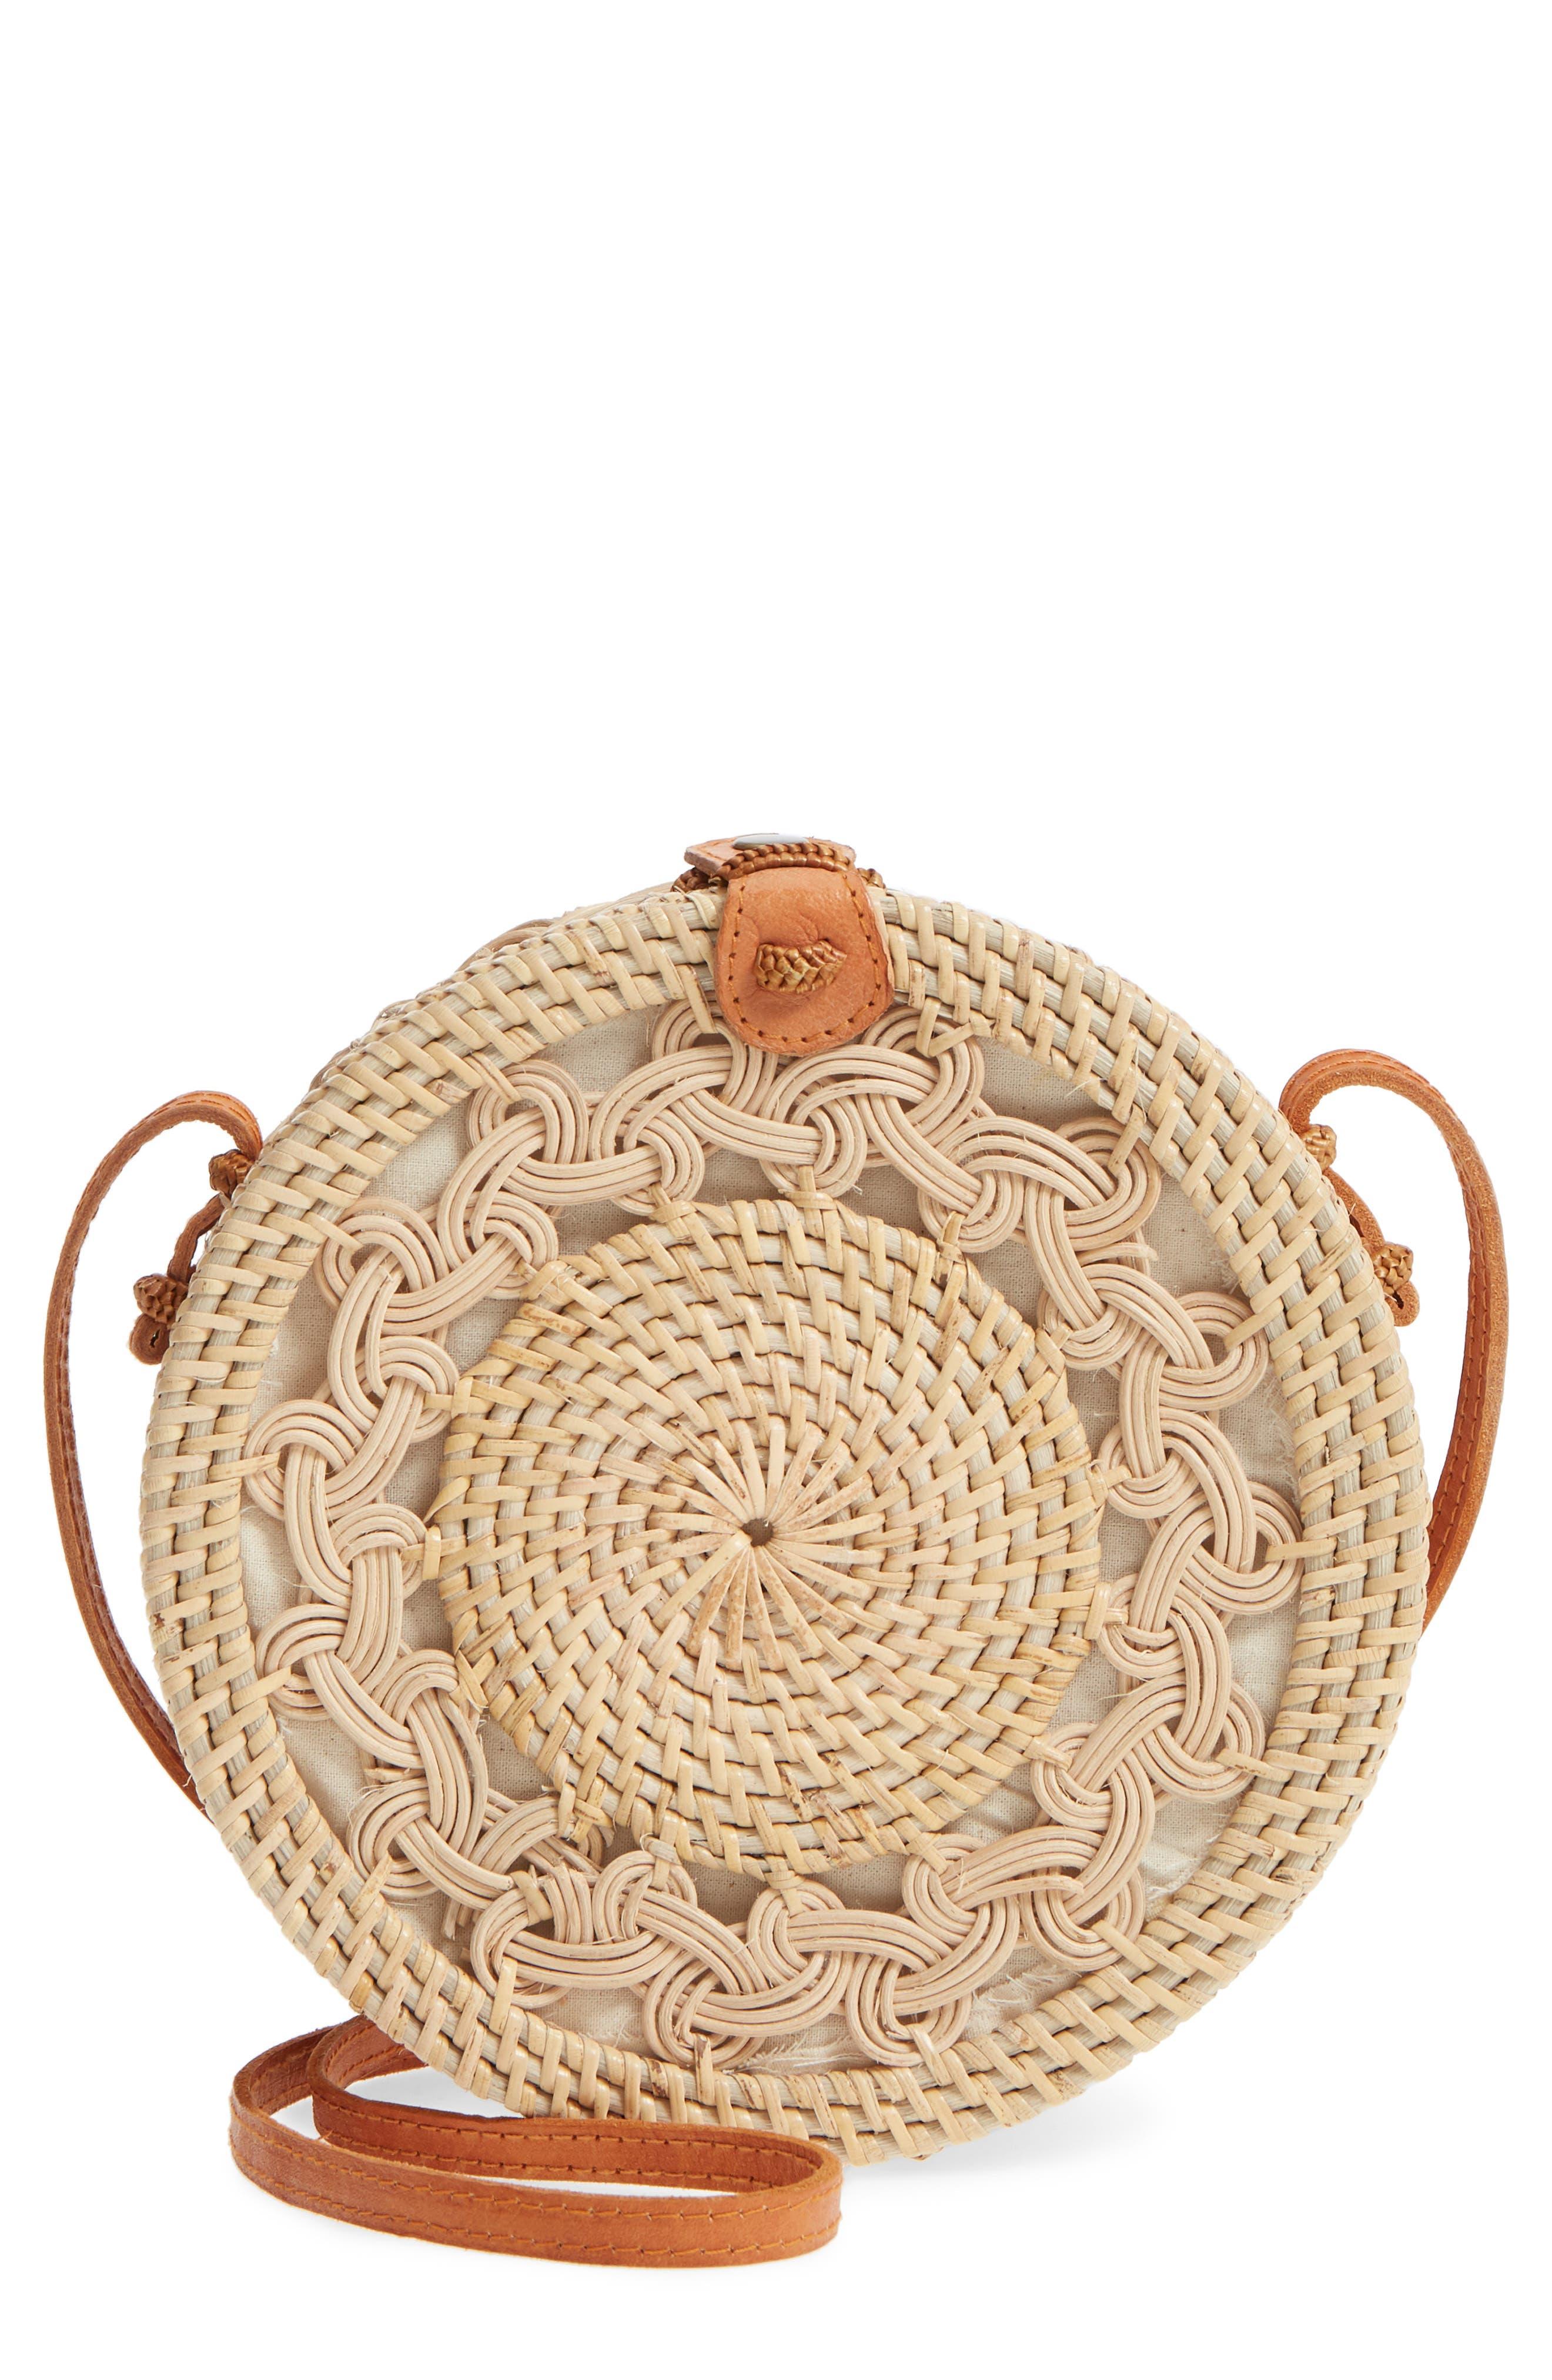 Woven Rattan Circle Crossbody Bag,                         Main,                         color, Lighter Tan/ Natural